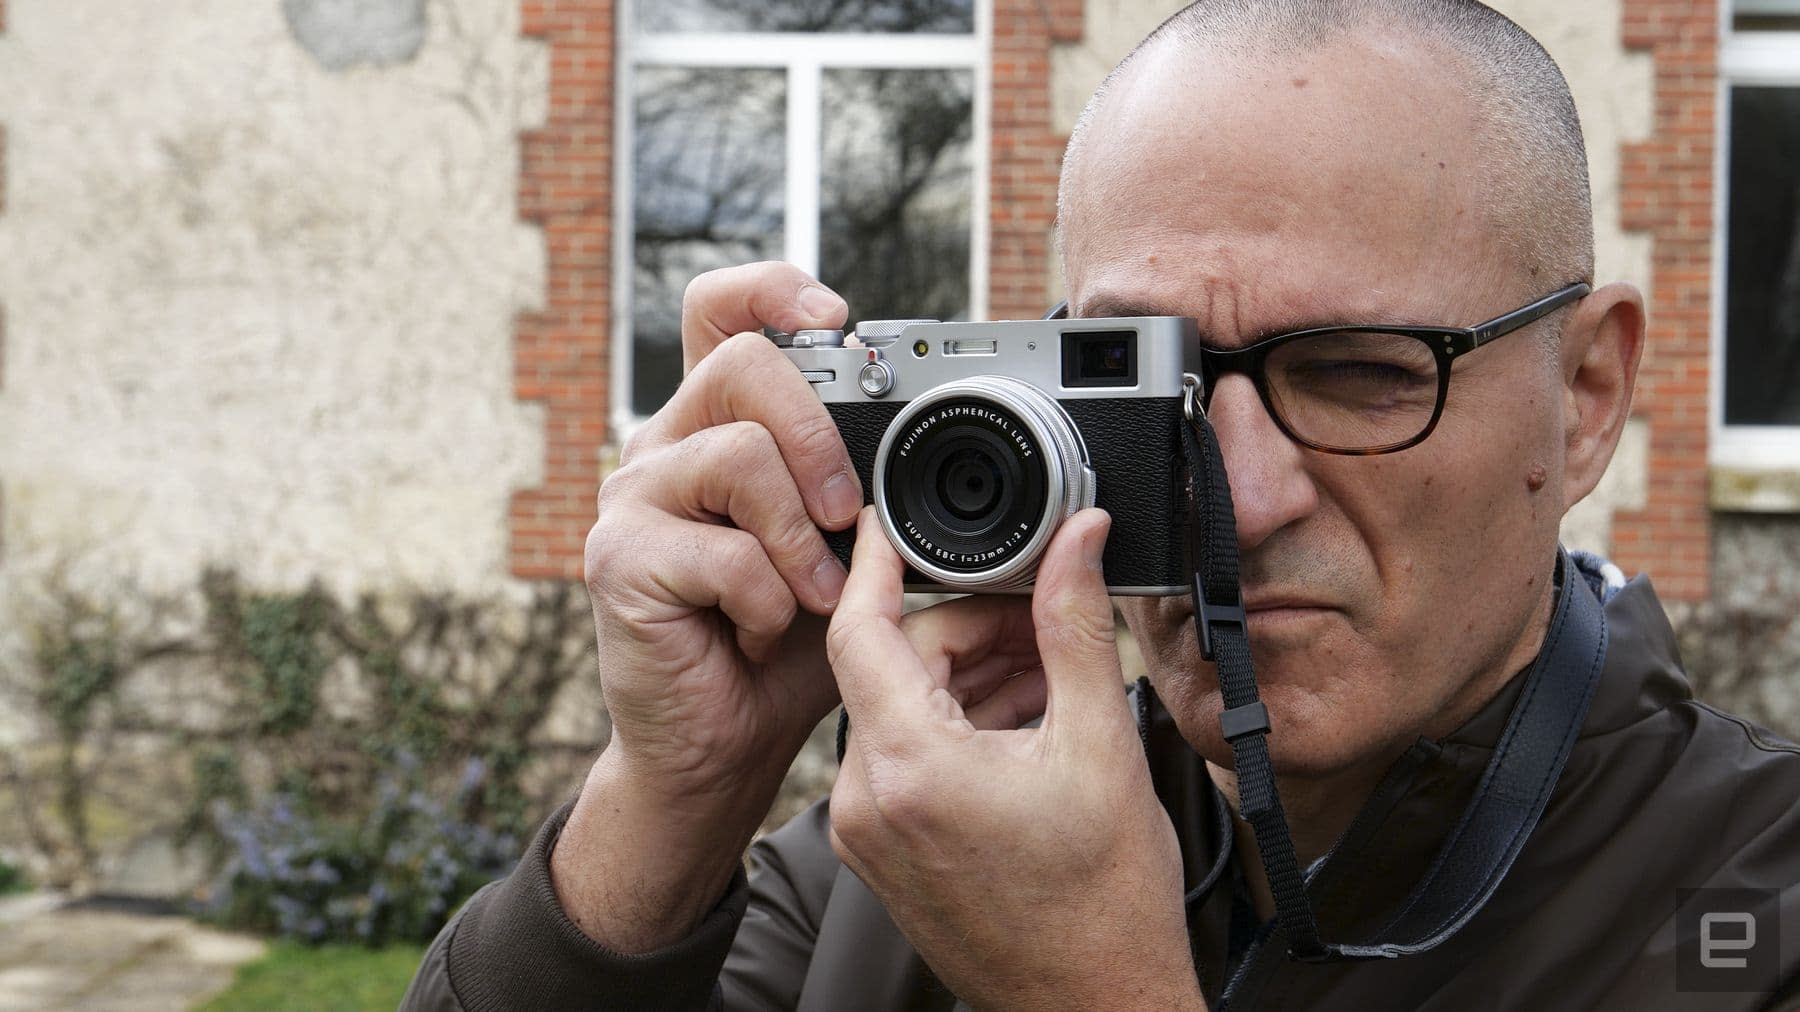 Fujifilm X100V compact fixed-lens camera